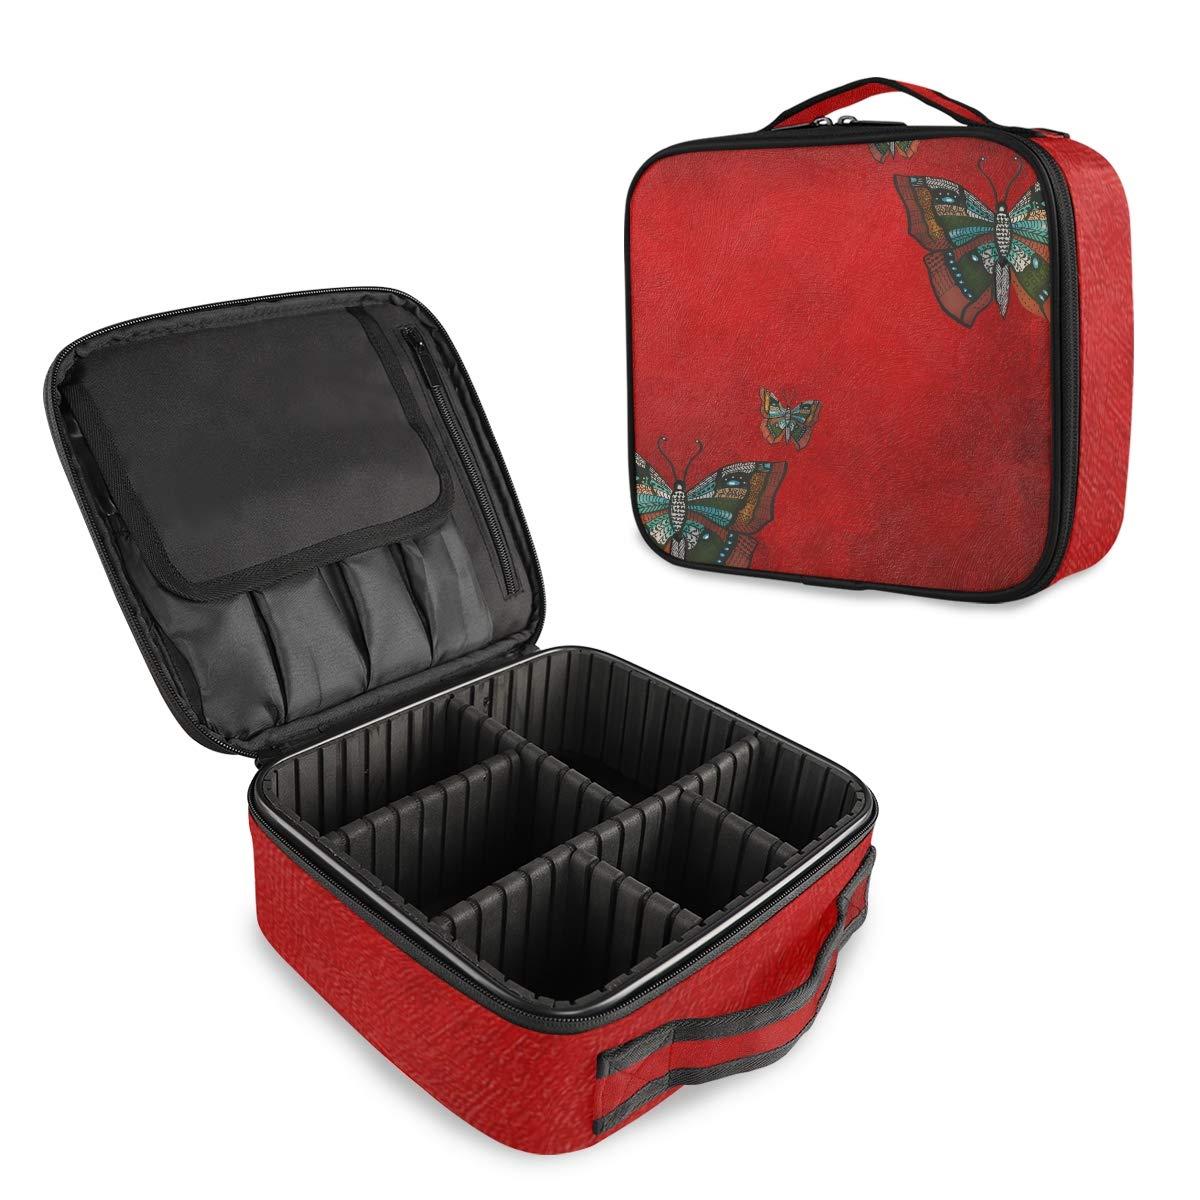 Butterfly Travel Makeup Case Portable Train Organizer Max 76% OFF Ca Washington Mall